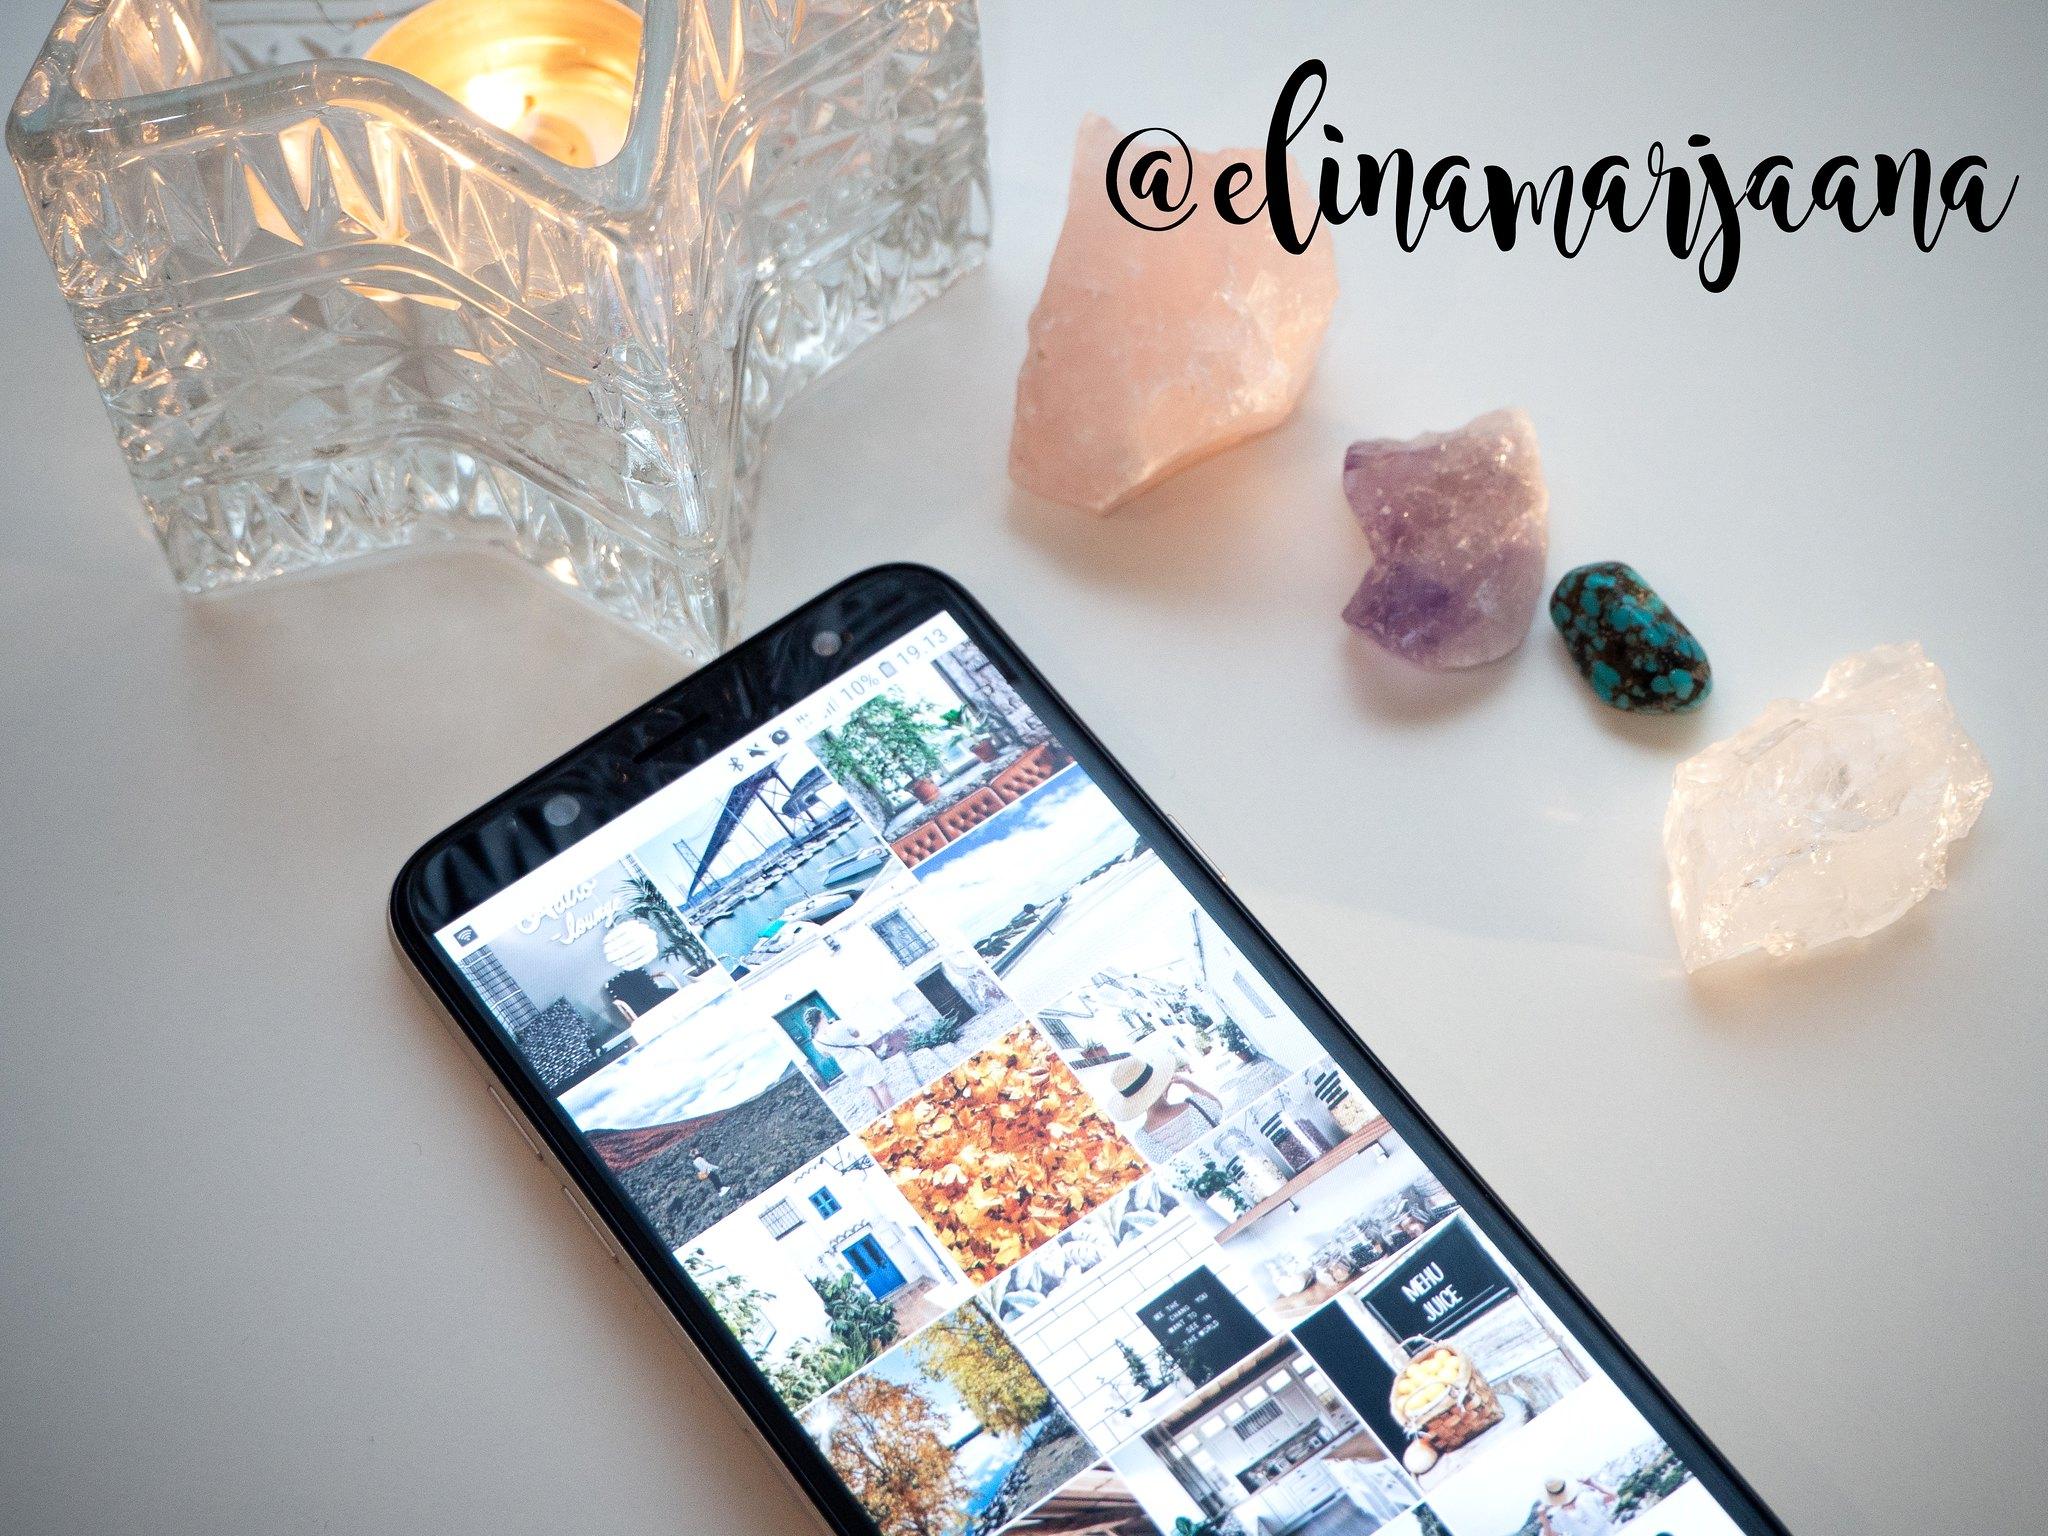 Kurkumalatte_Instagram7